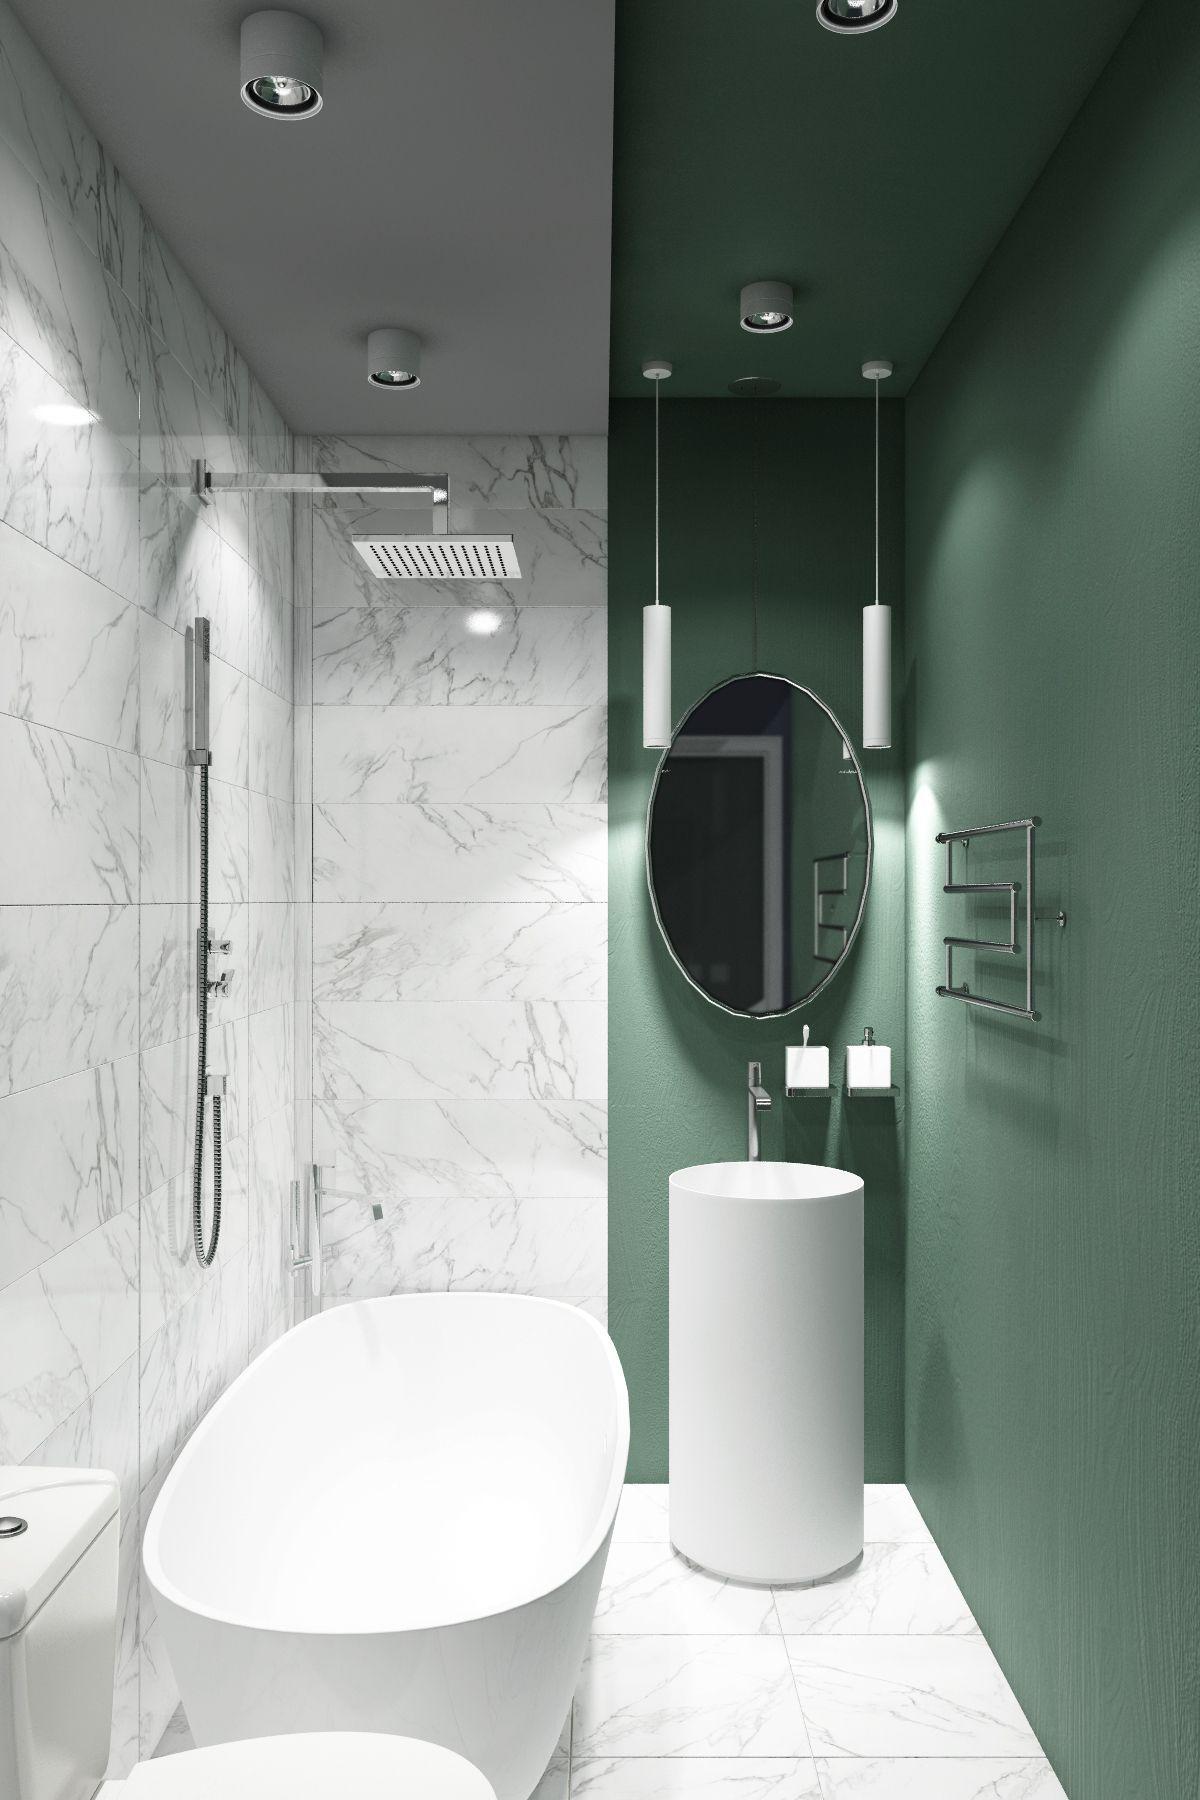 Meuble Salle De Bain Huy ~ adb9bd51616623 58f4acdd3ac03 jpg 1200 1800 interior furniture